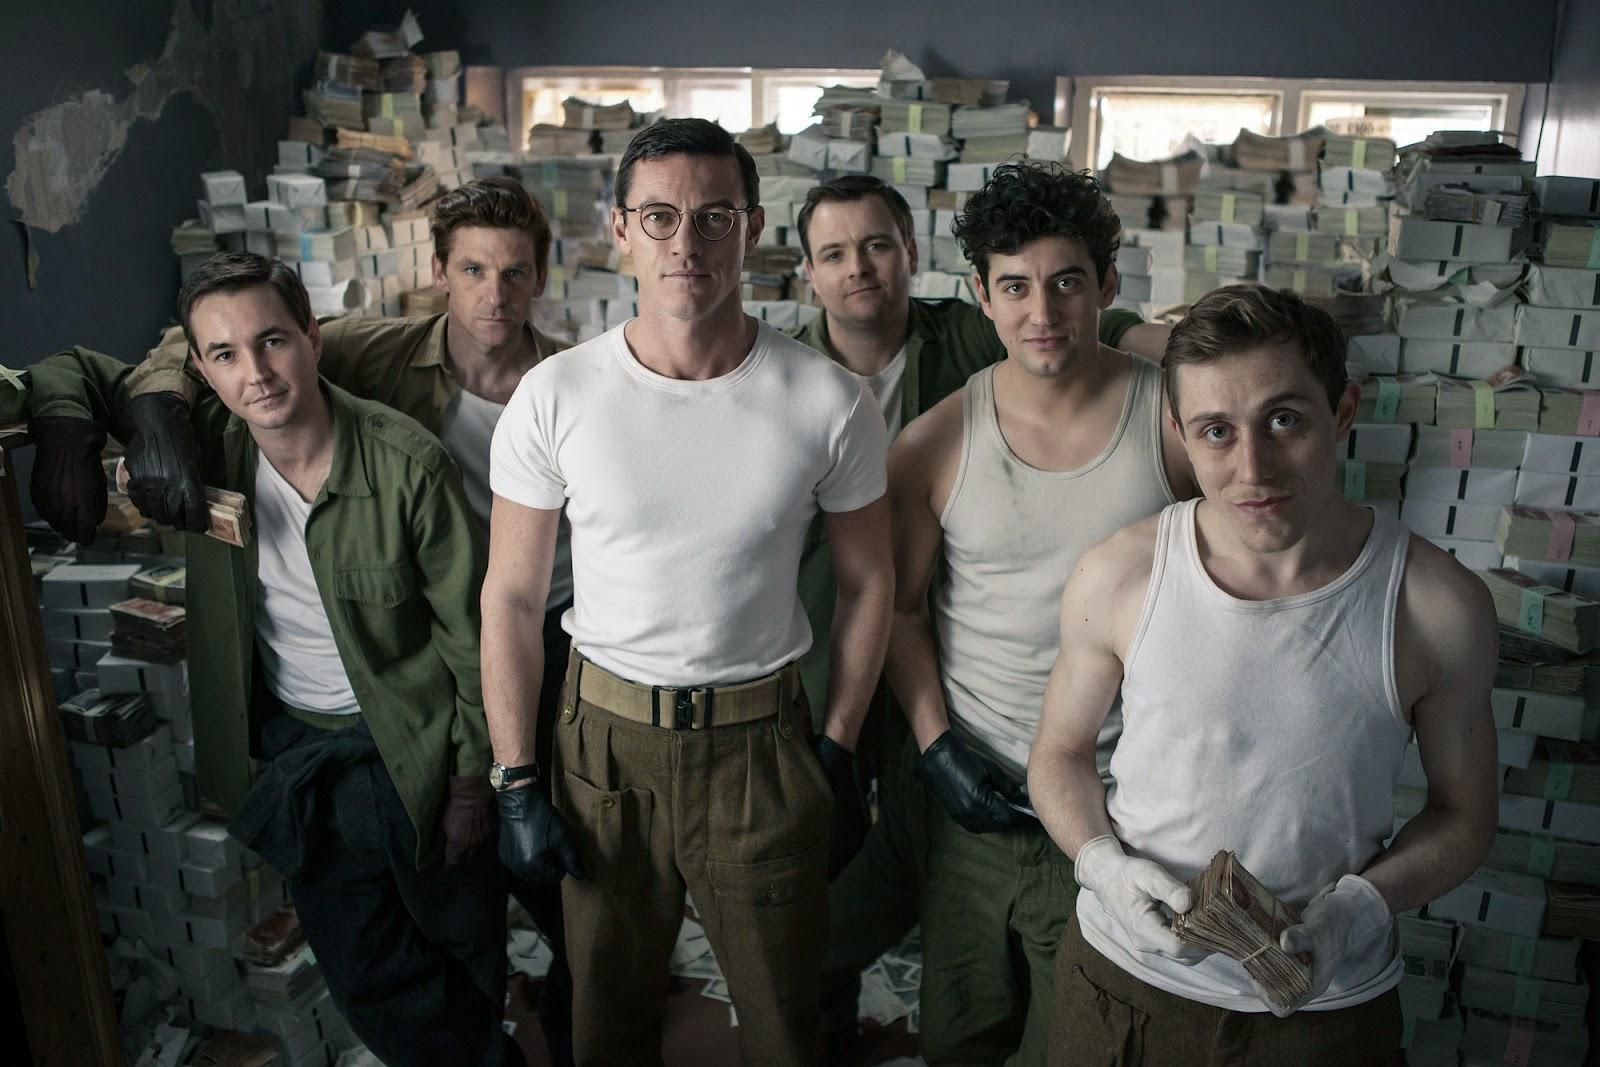 The Great Train Robbery, luke evans, a robber's tale, robo tren, glasgow, jim broadbent, 2013, bbc,el zorro con gafas